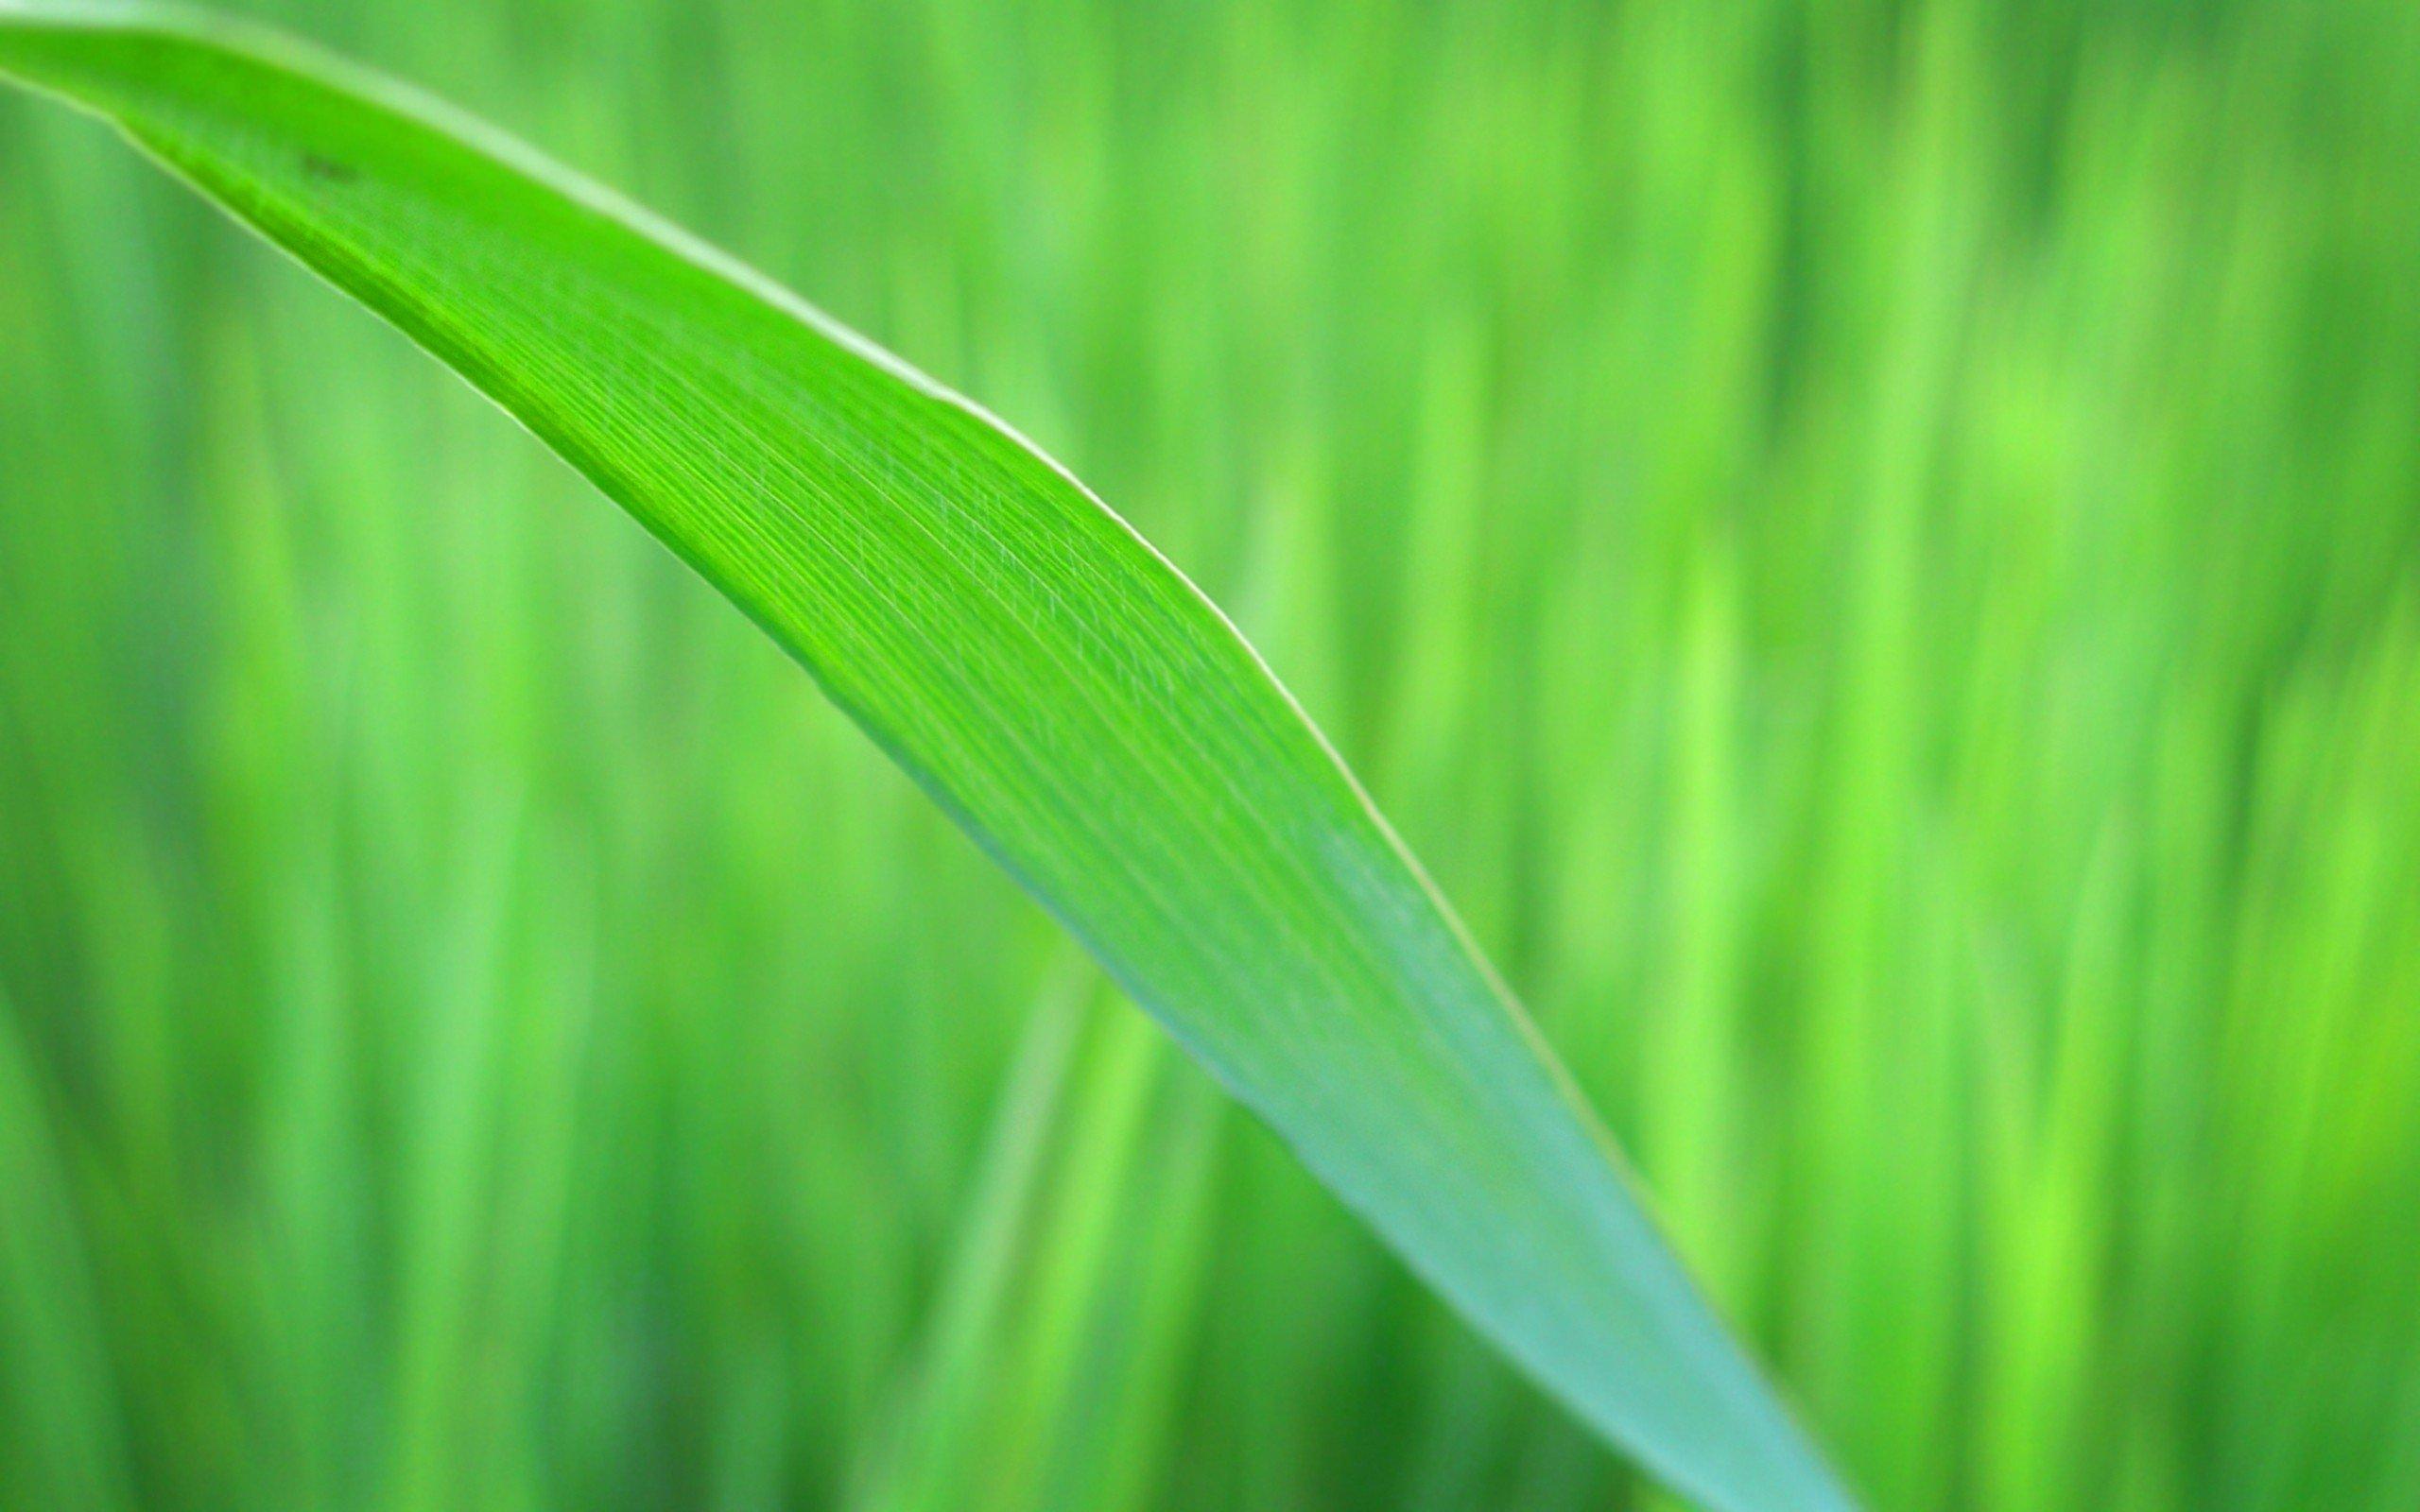 Grass Blade Close Up